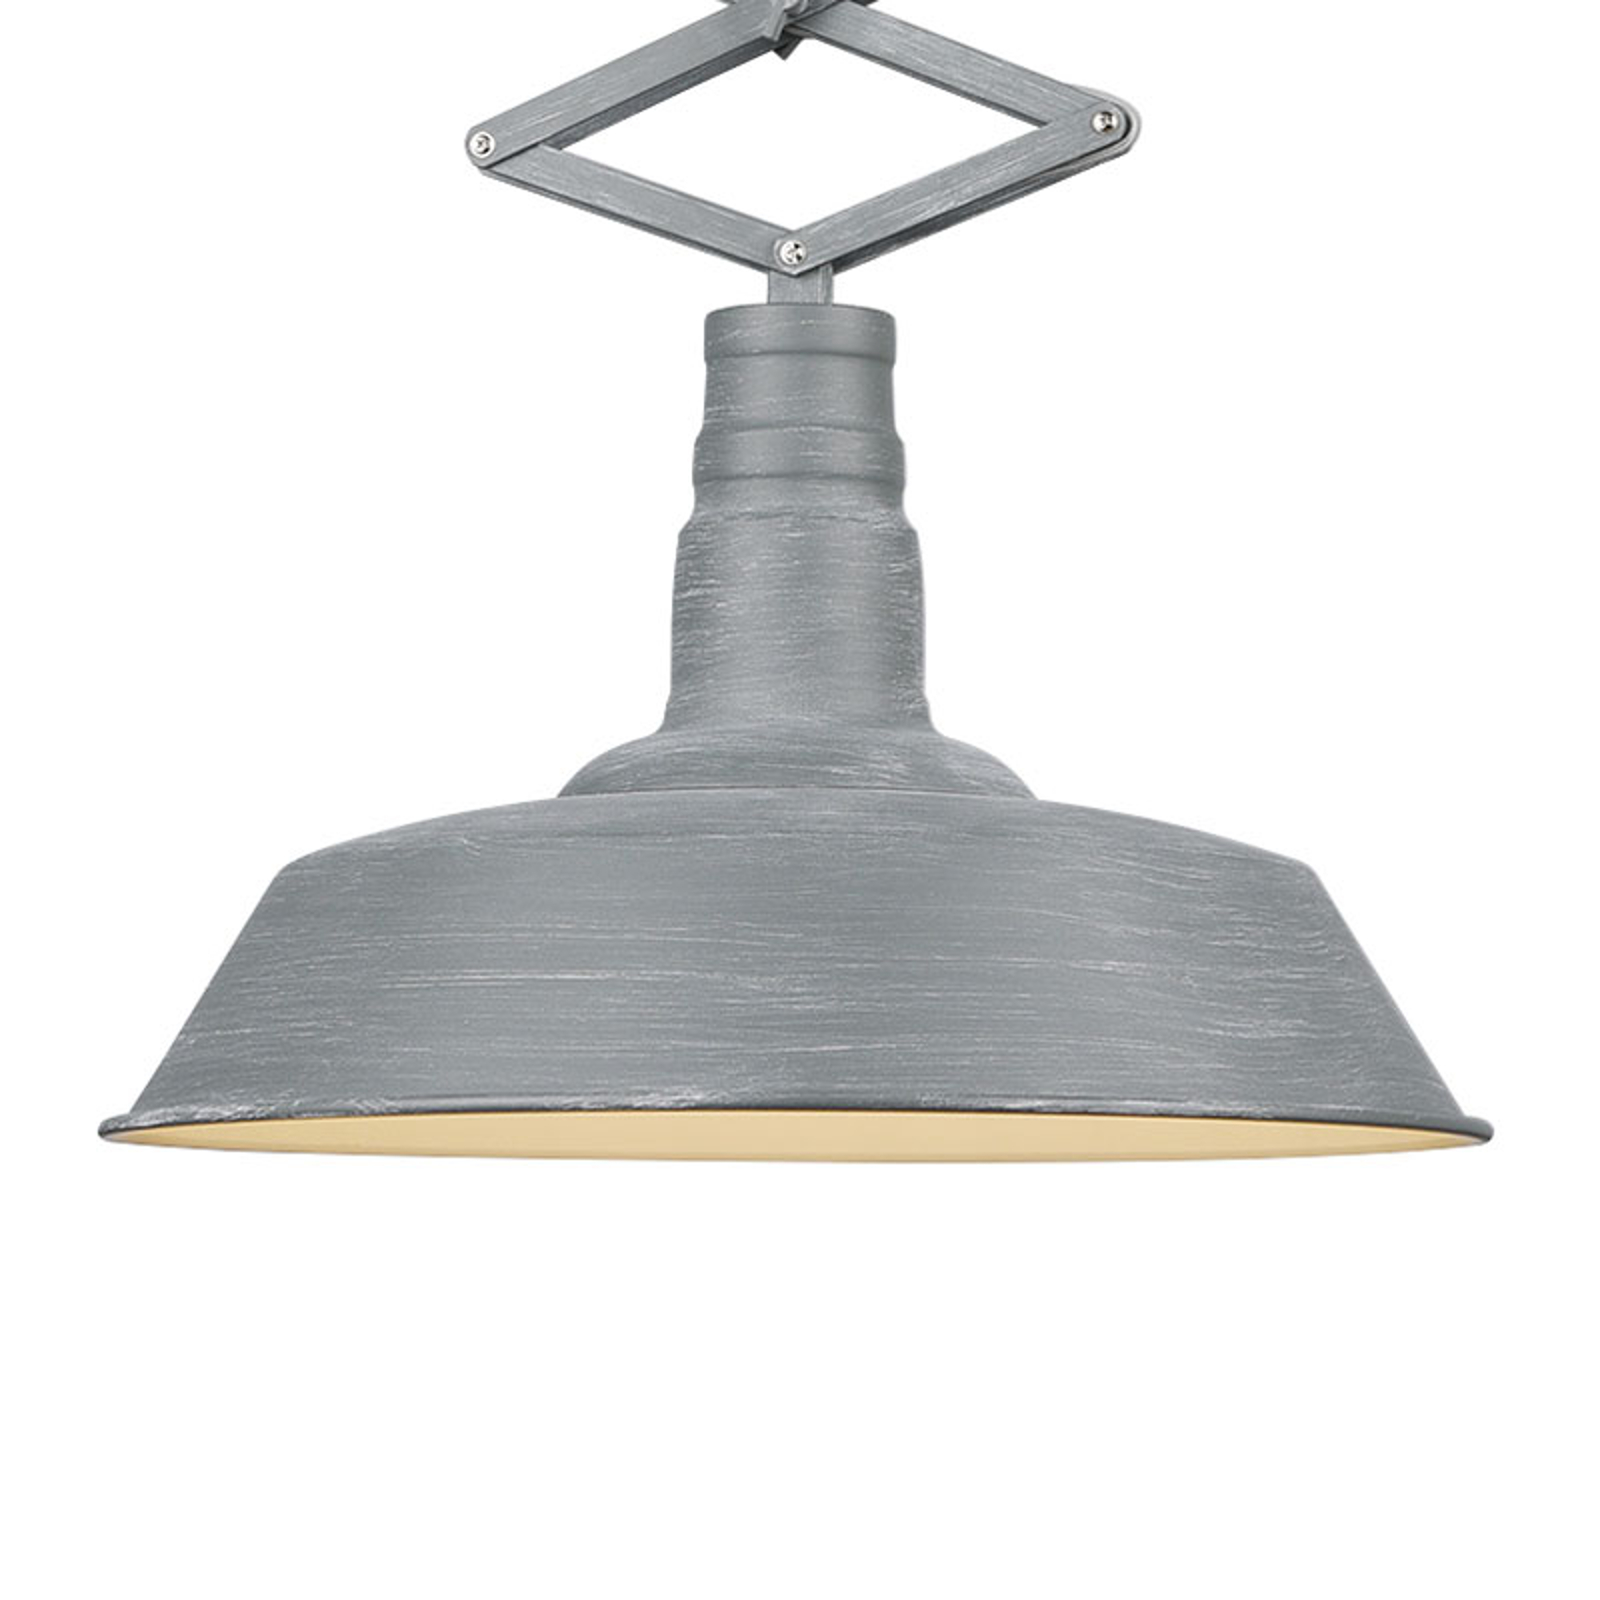 Lampa wisząca Detroit regulowana szary beton